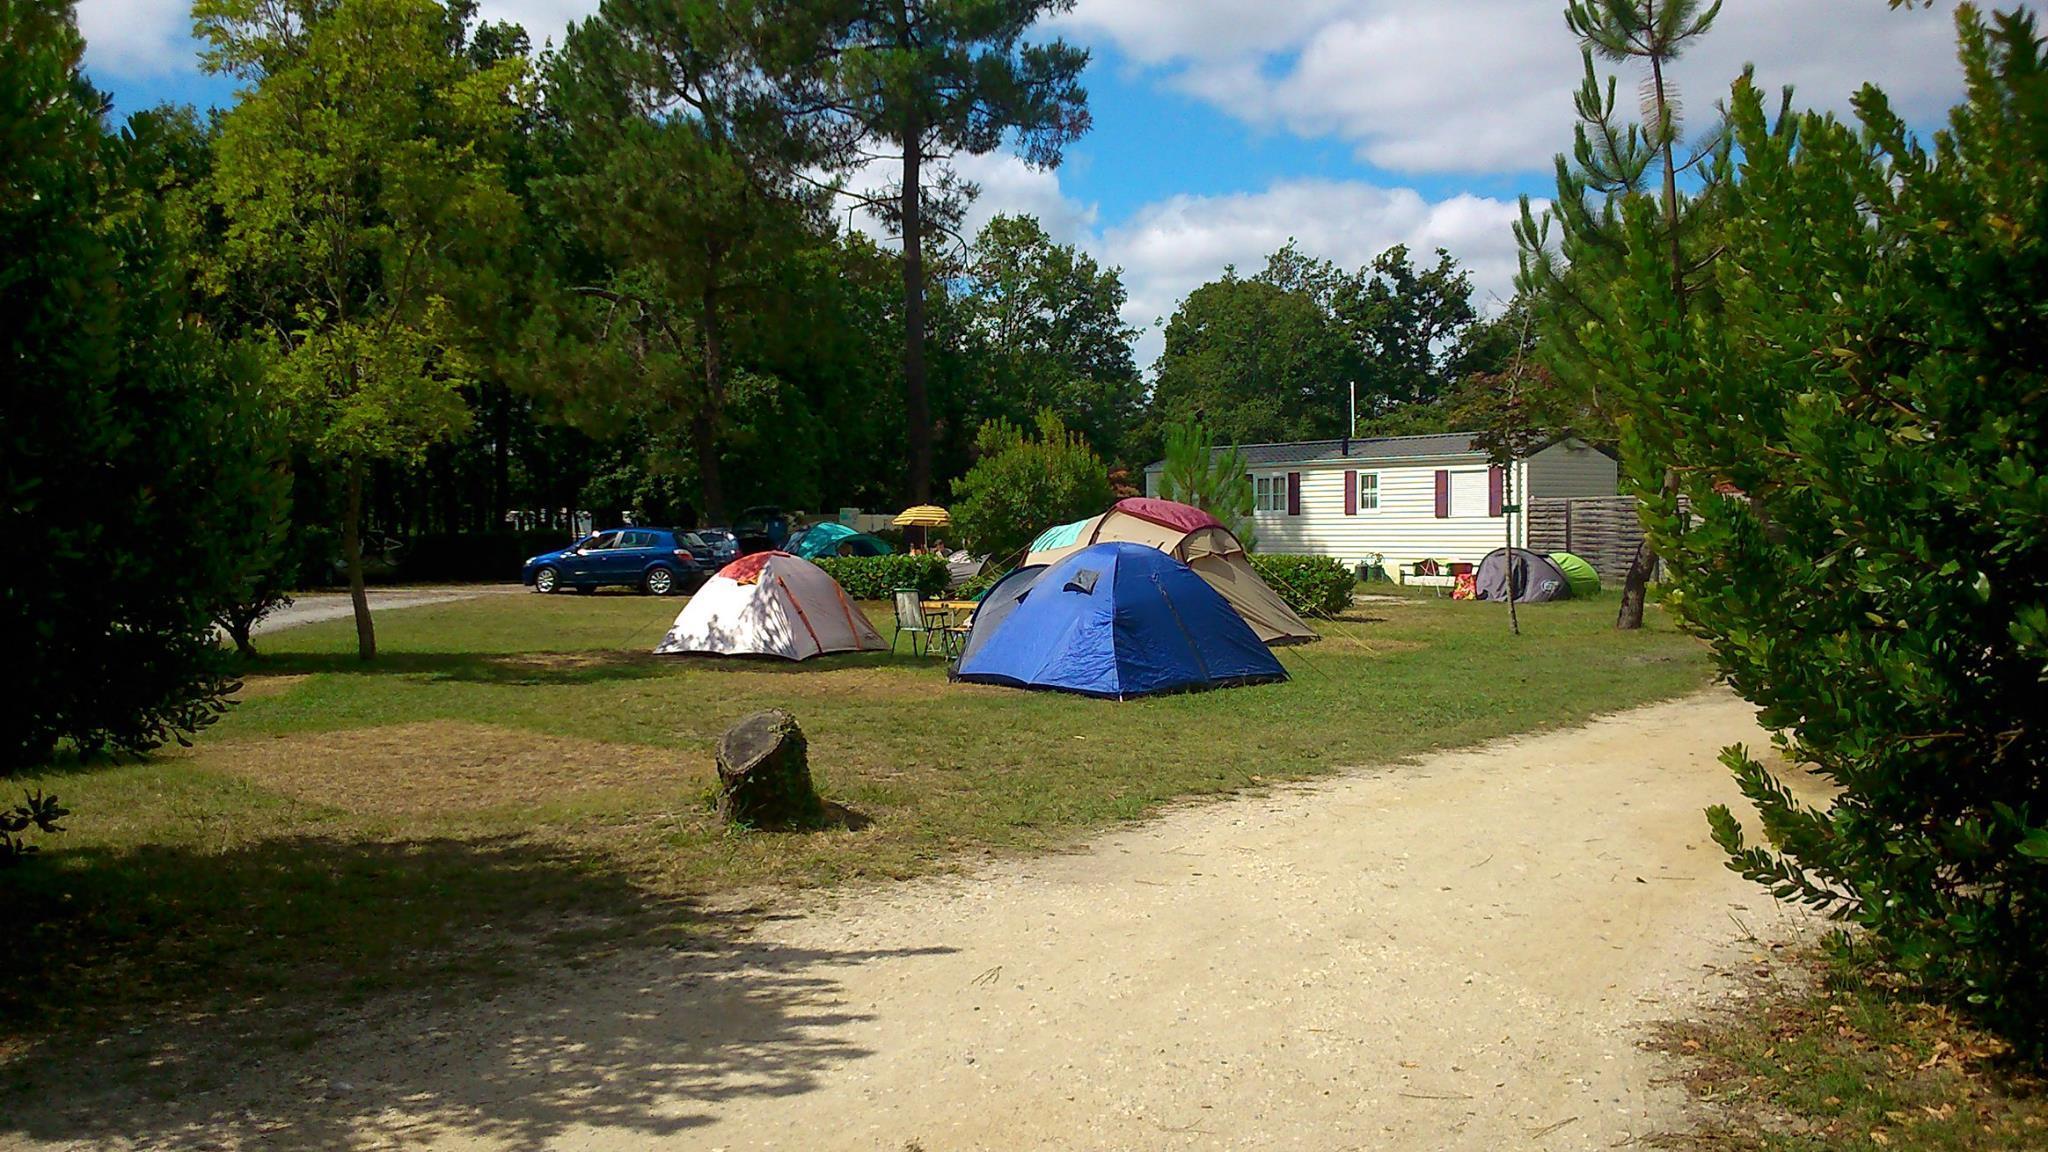 Camping l'Orée du Bois, Hourtin, Gironde